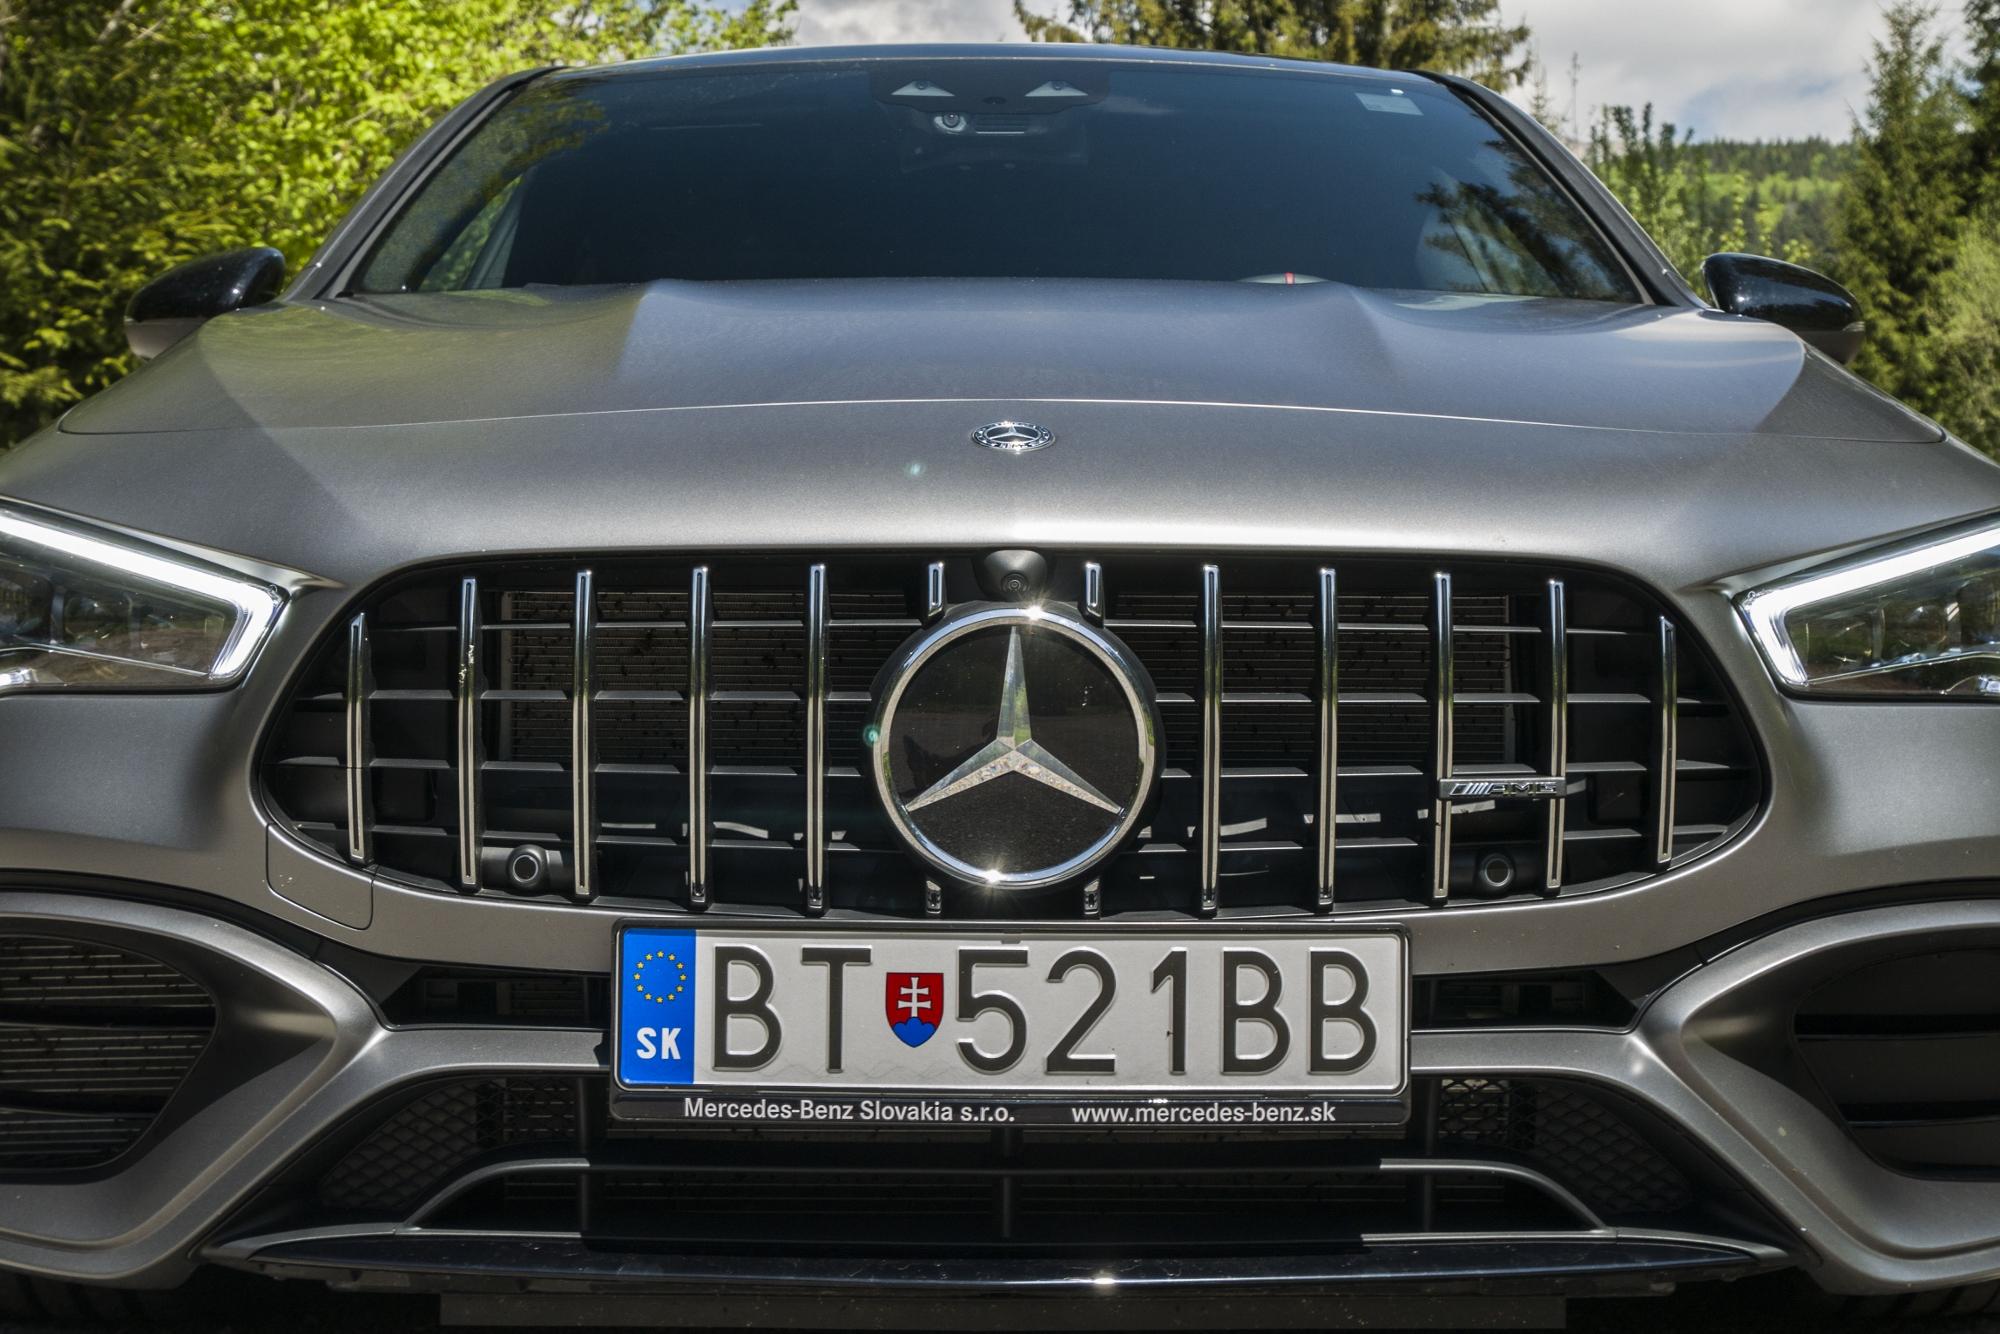 Mercedes CLA AMG 45 S (48)